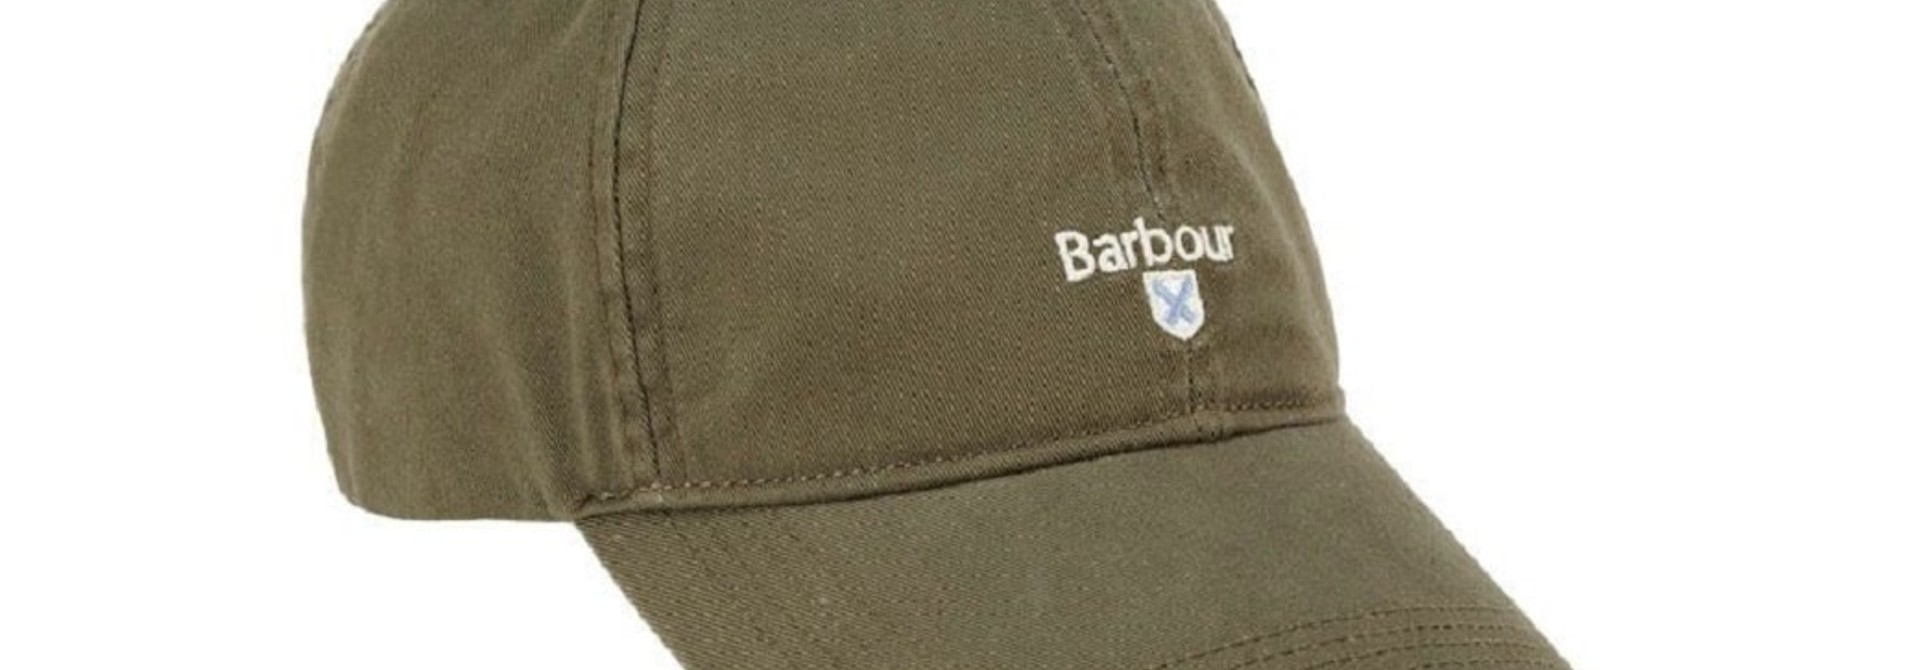 Barbour Cascade Sports Cap Olive